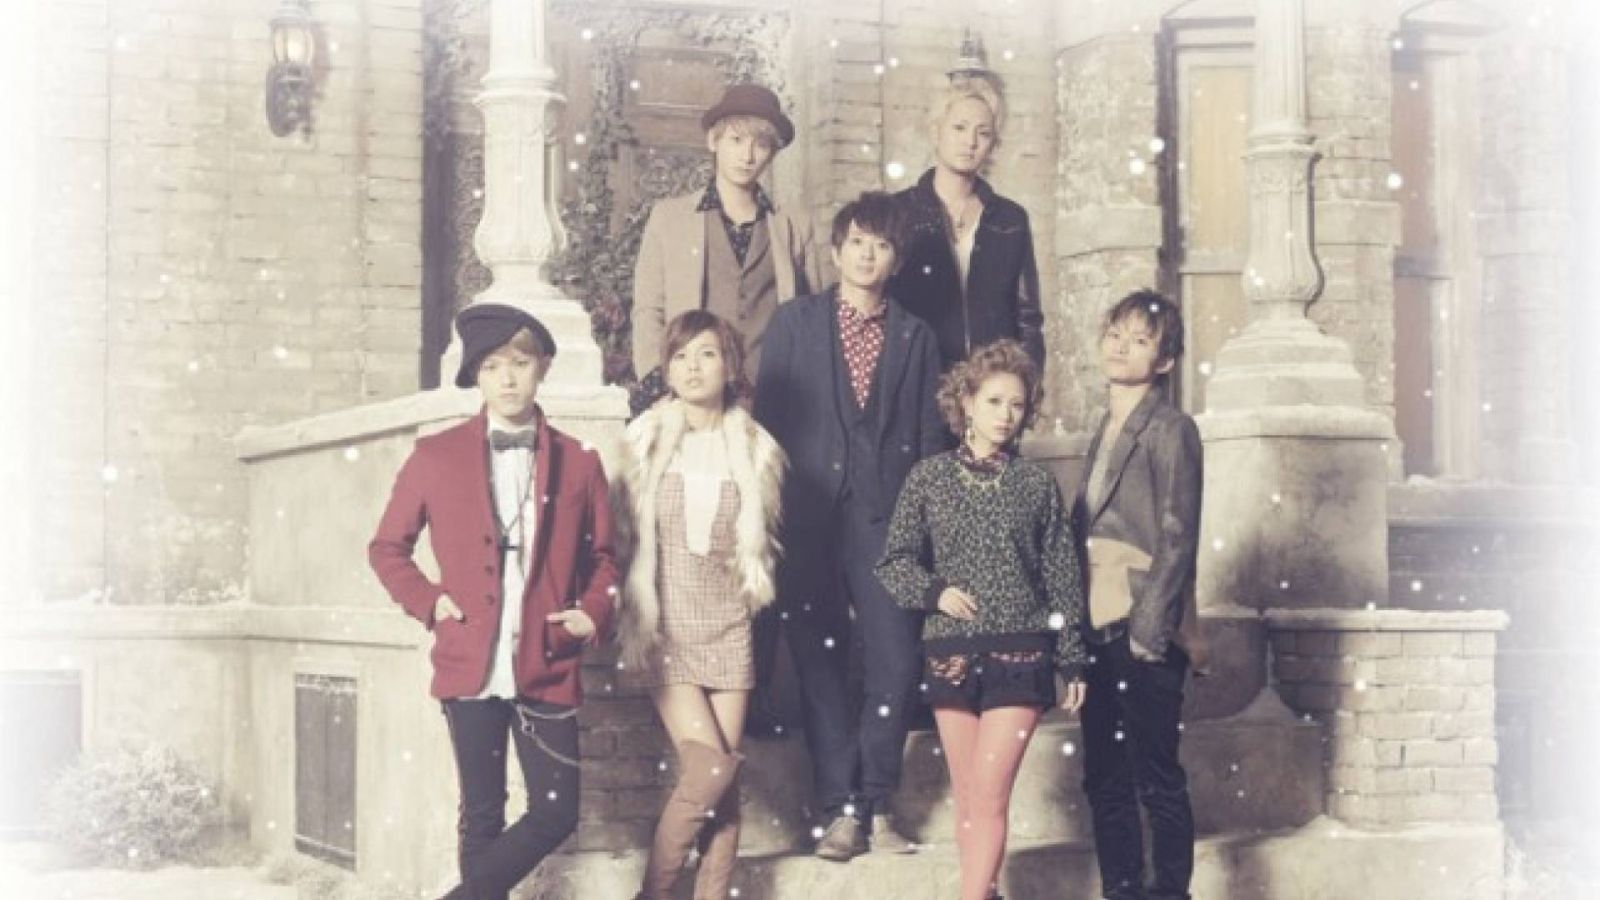 Novo single do AAA © Avex Entertainment Inc. / e-talentbank